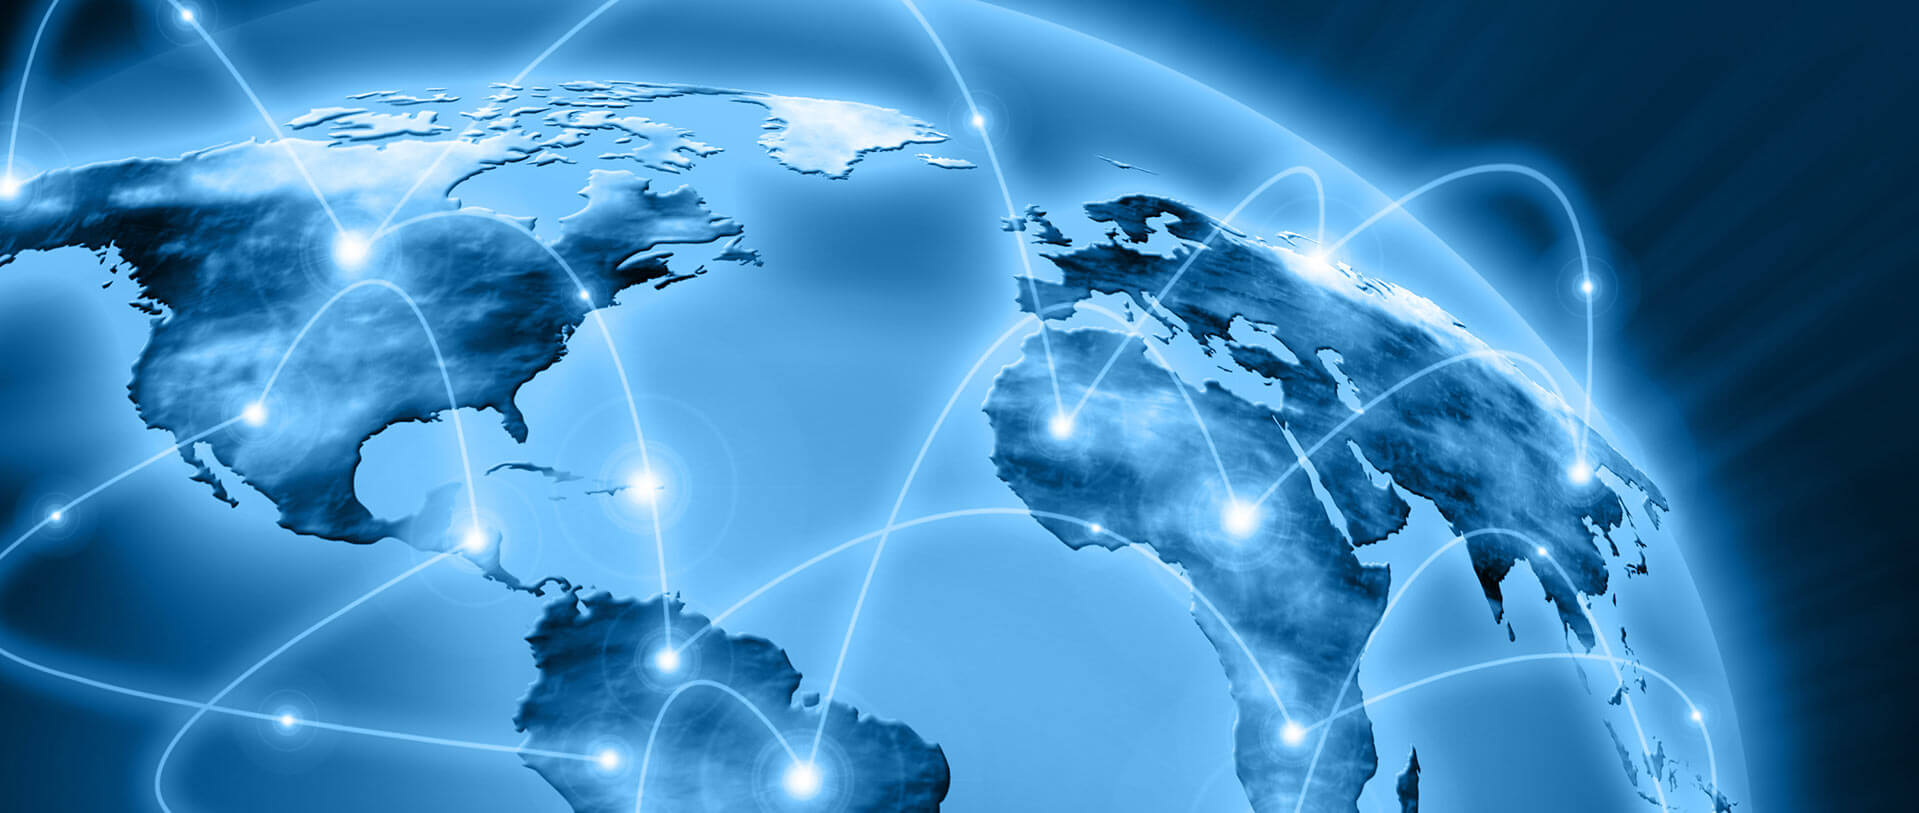 Global-Innovation-Collider-Image-1